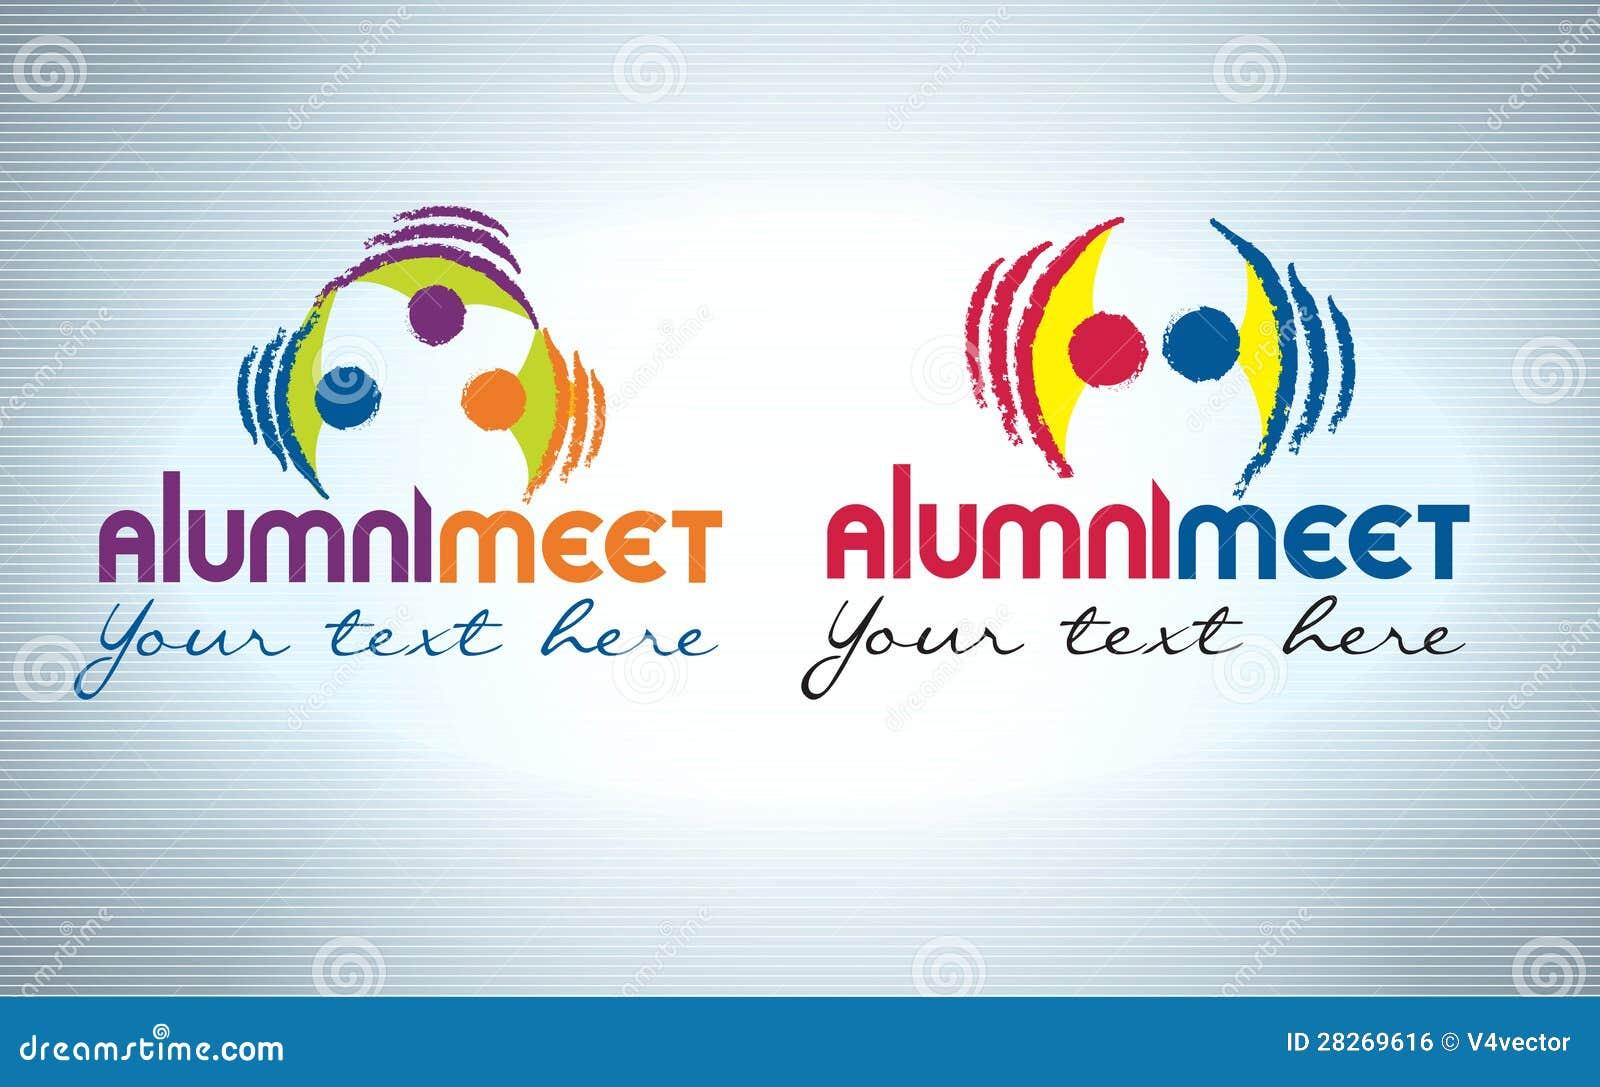 Alumni Logo Design Vector Free Download